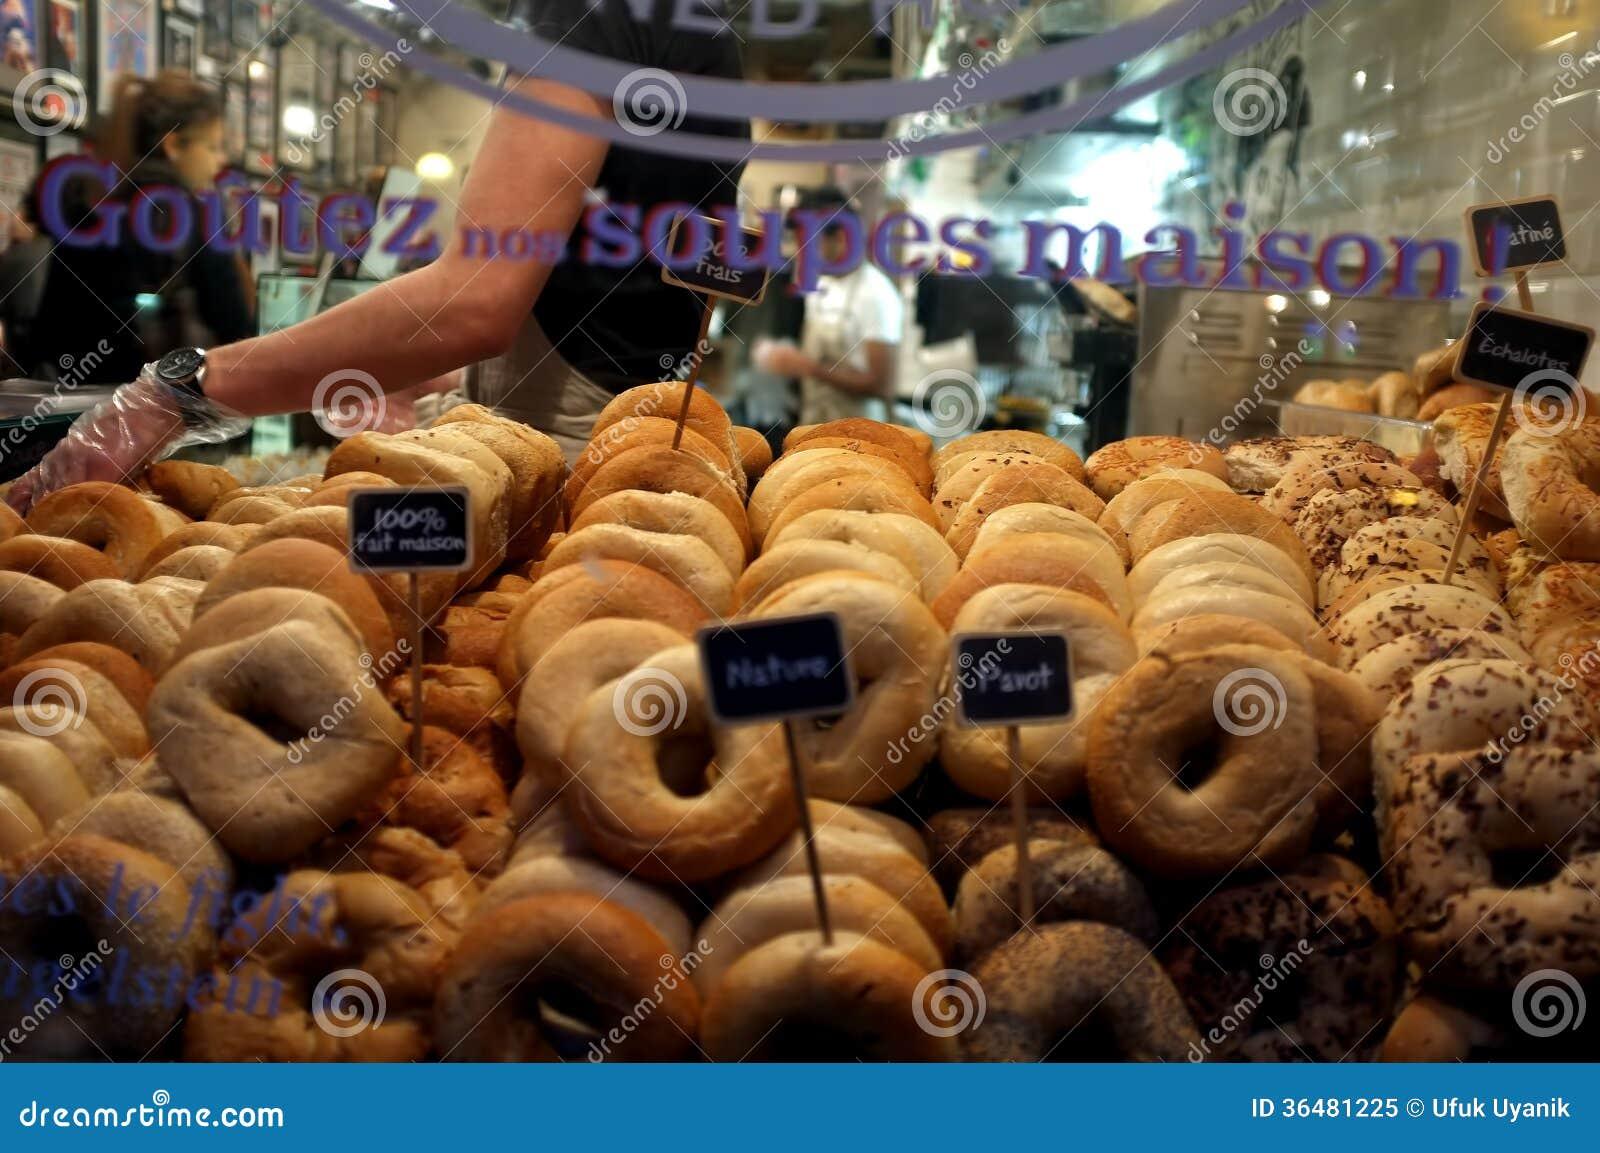 bagel shop business plan